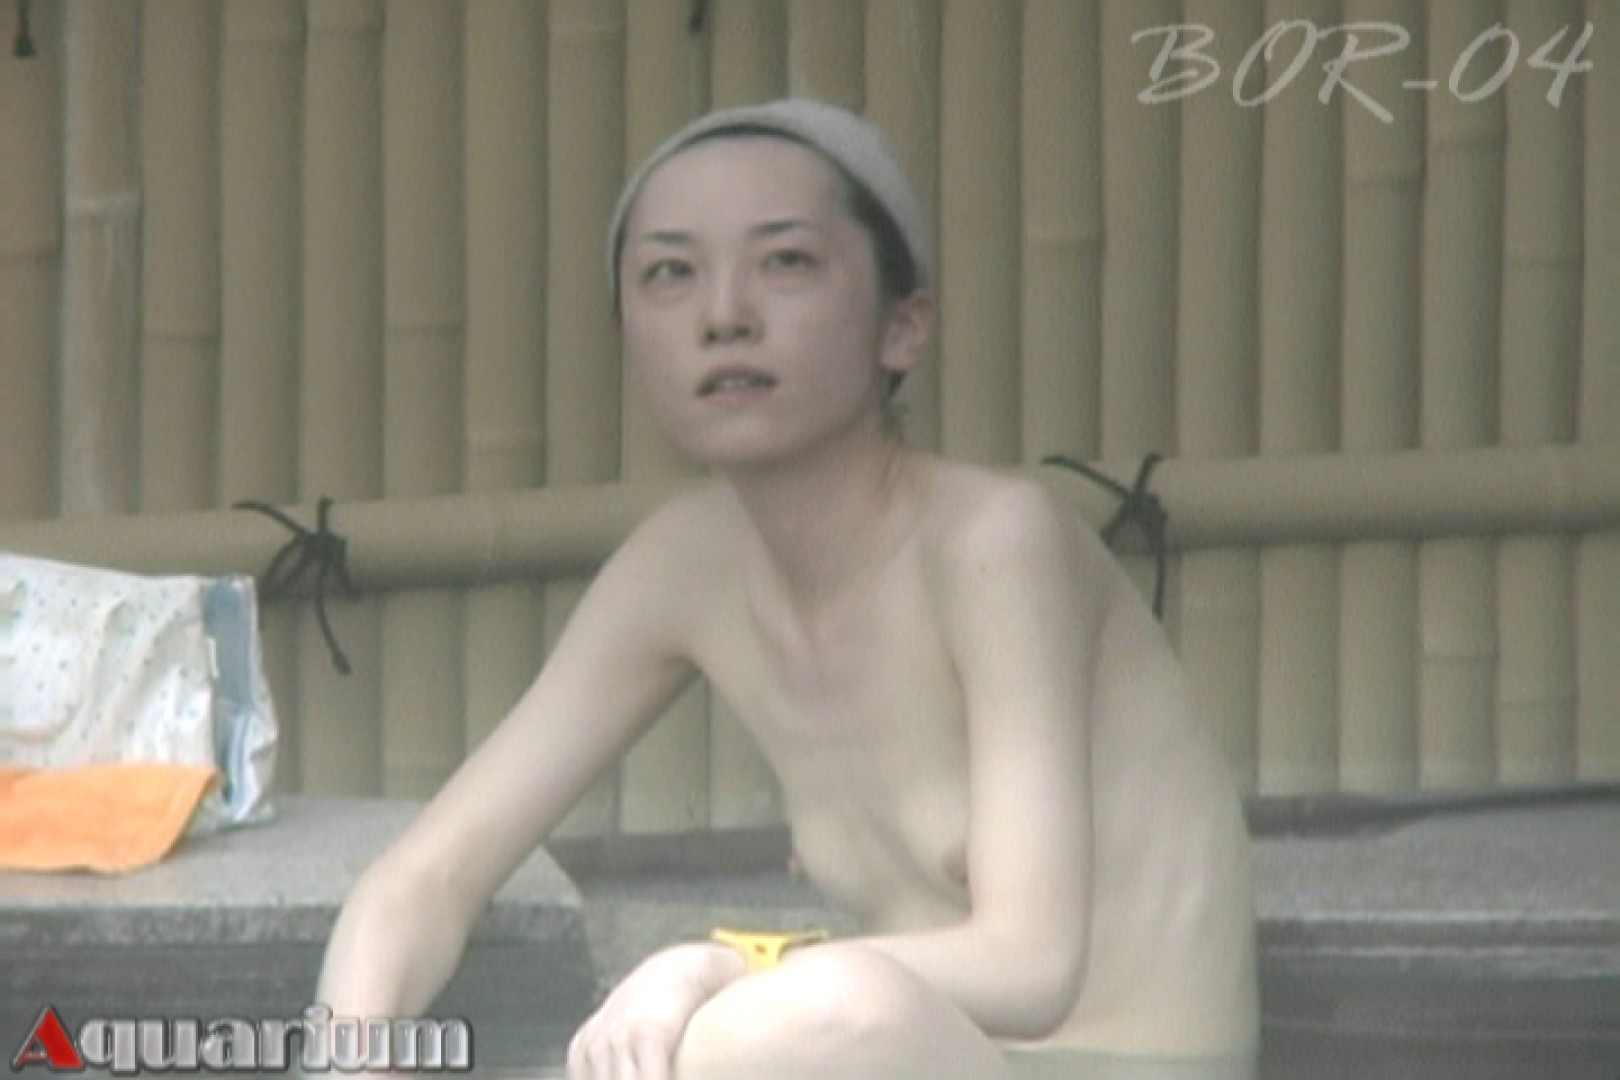 Aquaな露天風呂Vol.510 エッチな盗撮 オマンコ無修正動画無料 110pic 79